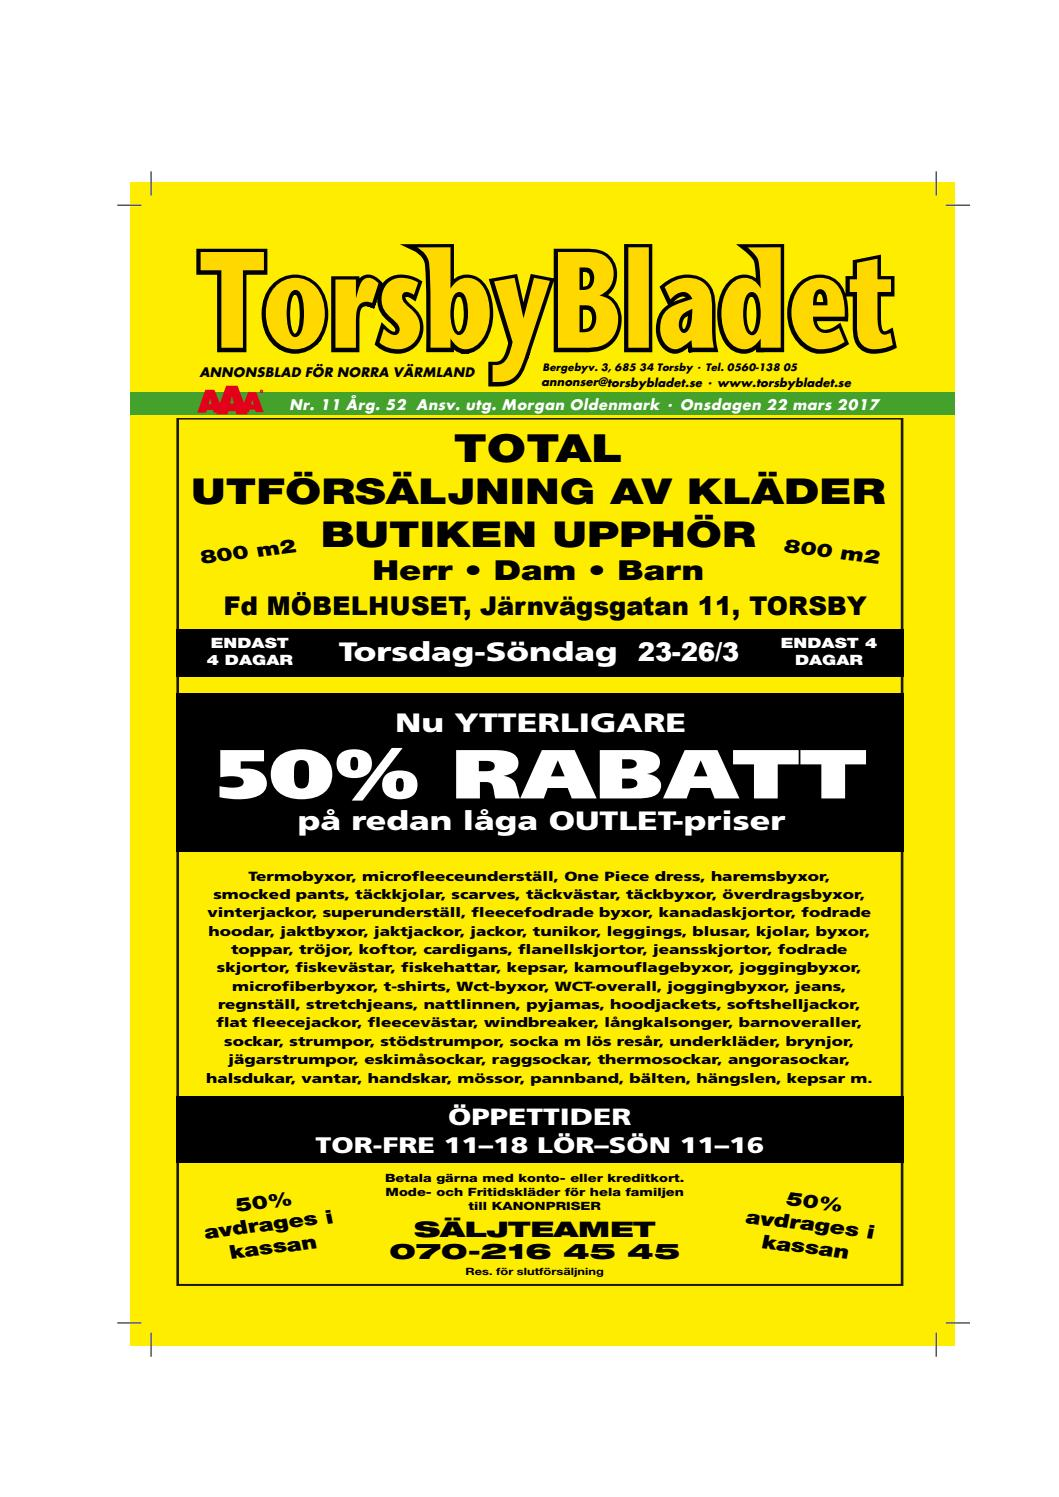 Vilket r ditt smultronstlle? - Torsbybladet